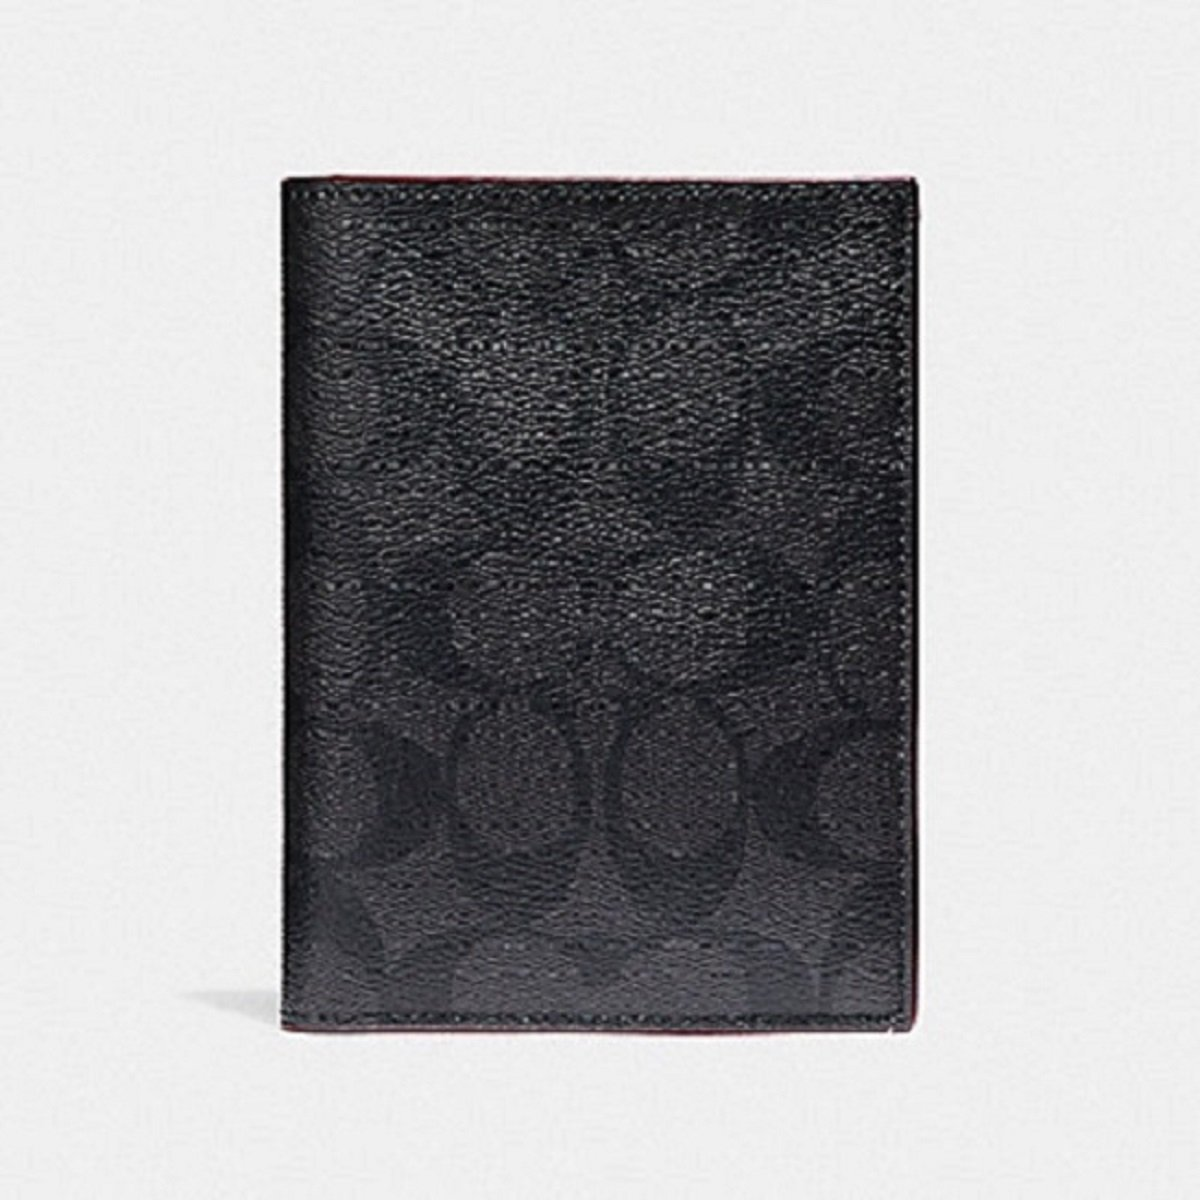 Coach Men's F26074 Passport Case in Signature Charcoal/ Black by Coach